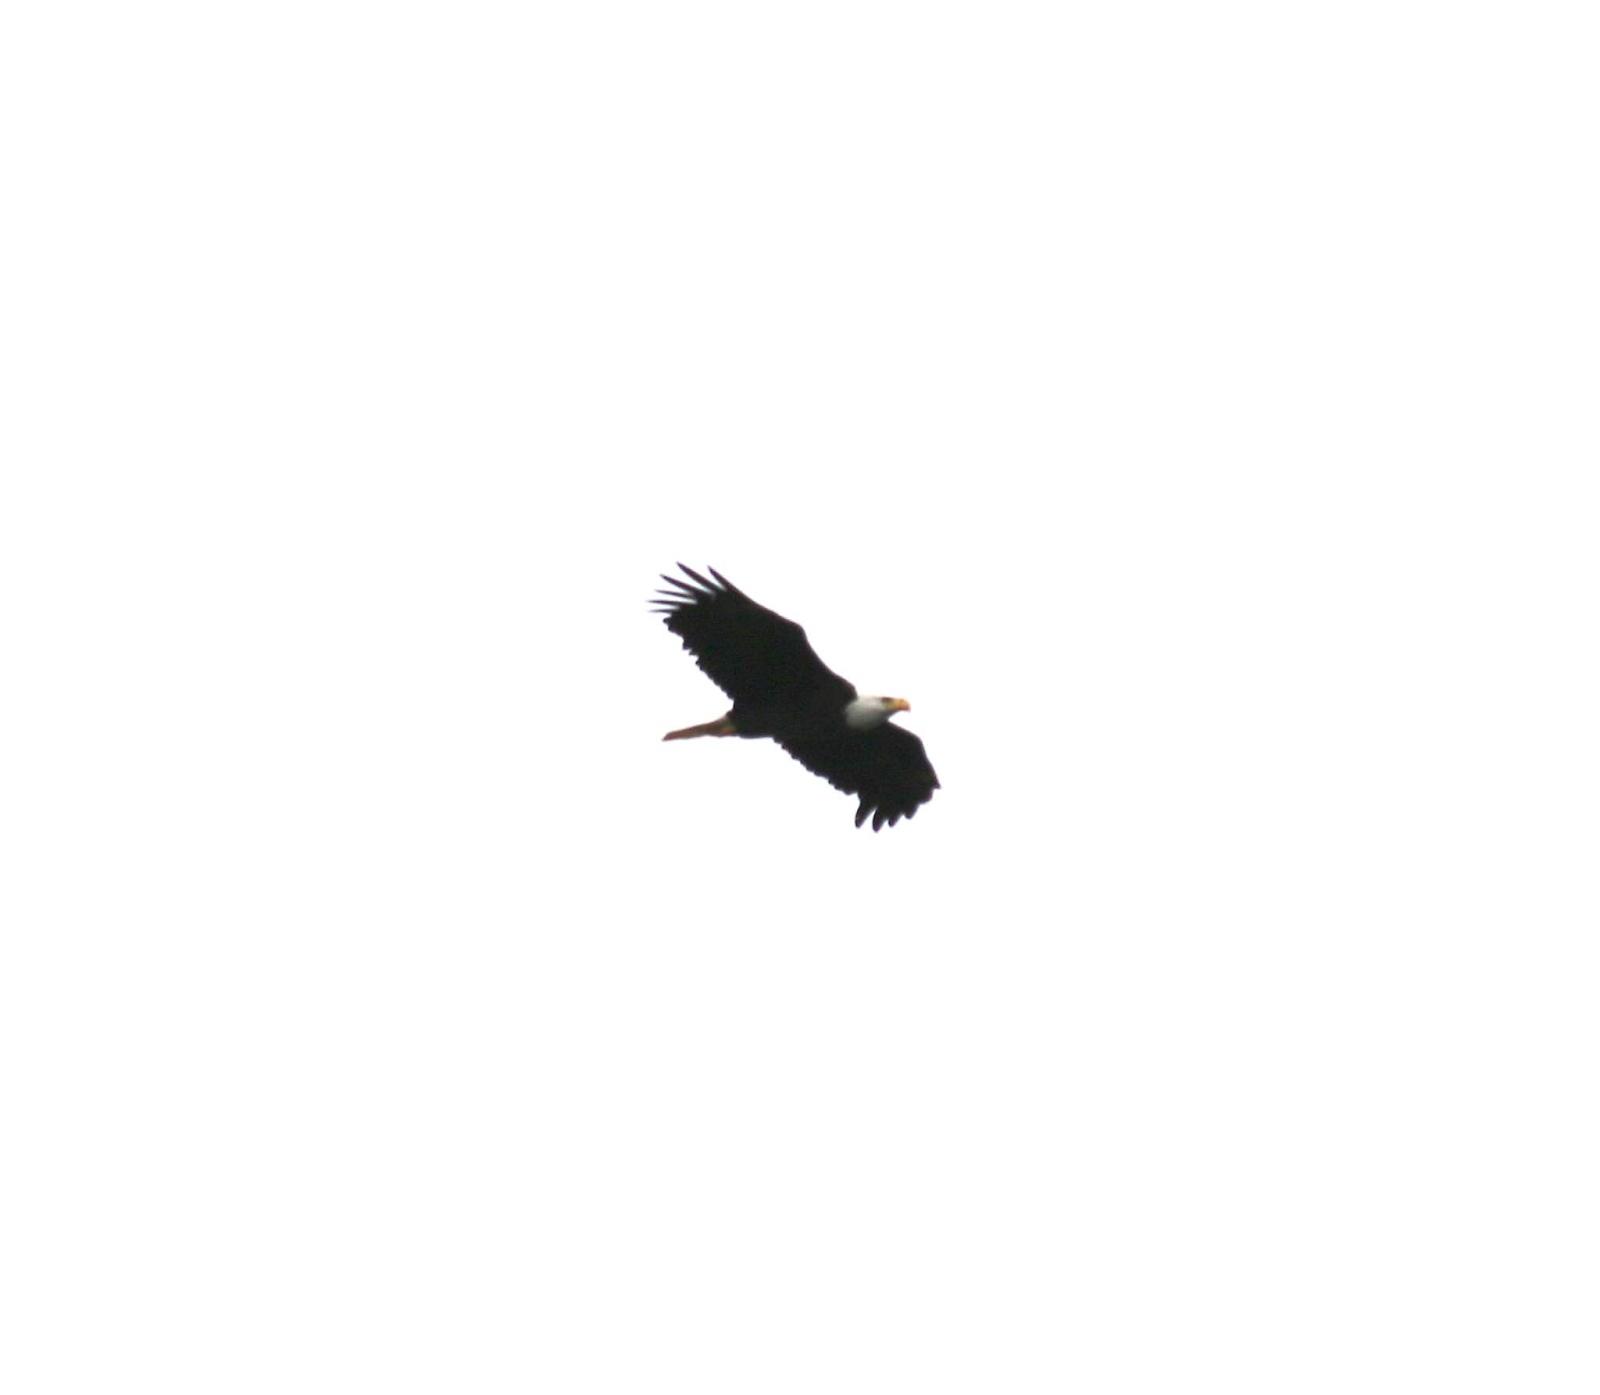 Allegheny Front Hawk Watch: Stunning Overlook for Bird